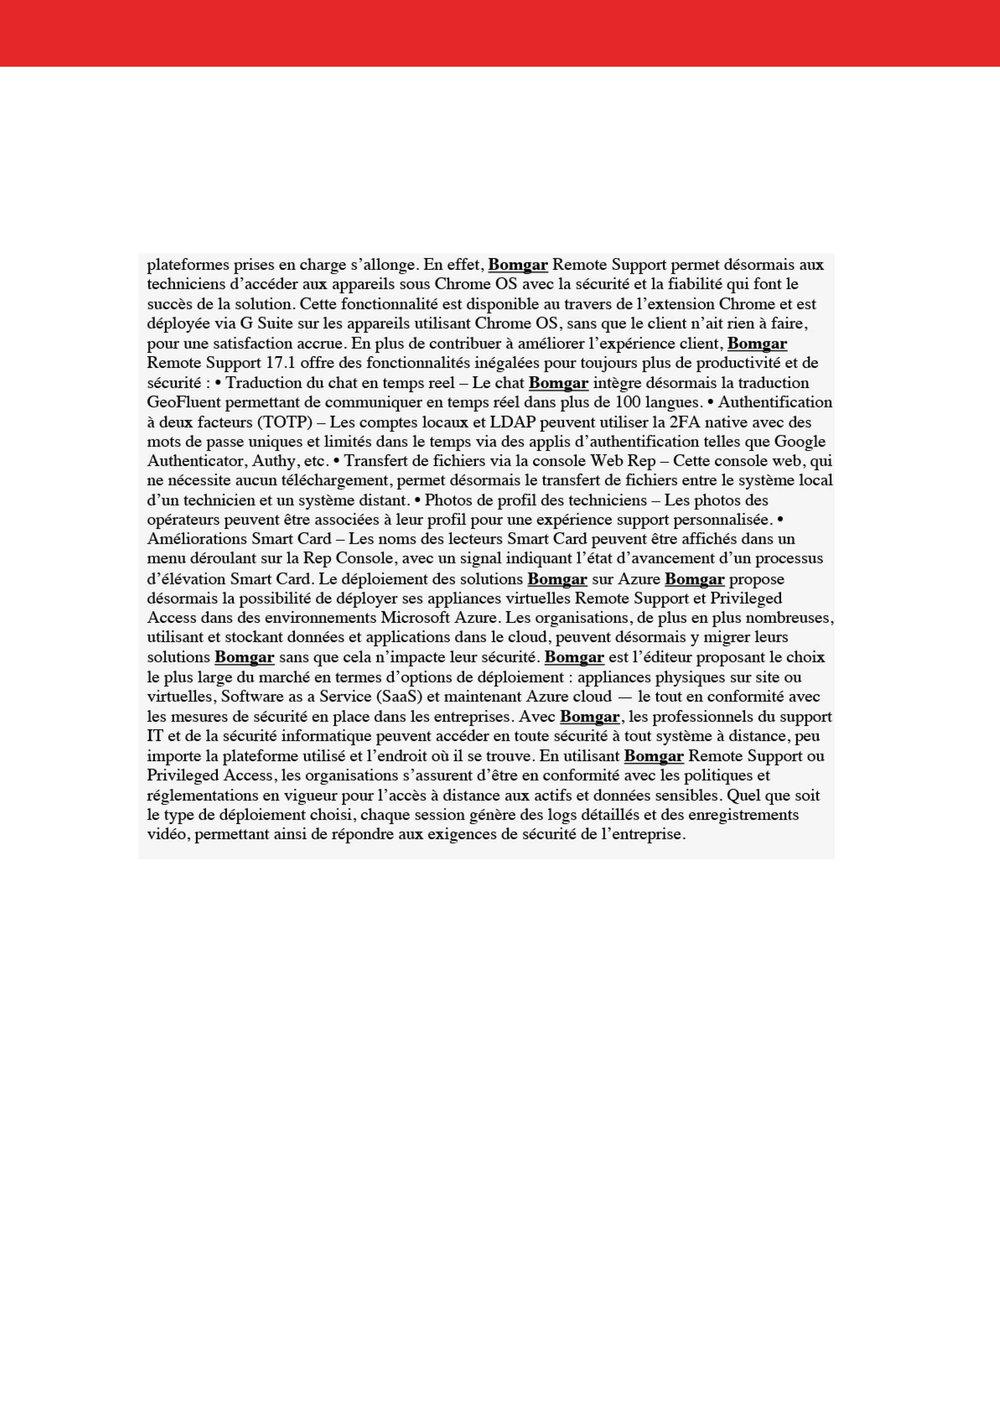 BOOKMEDIA_DEC6.jpg